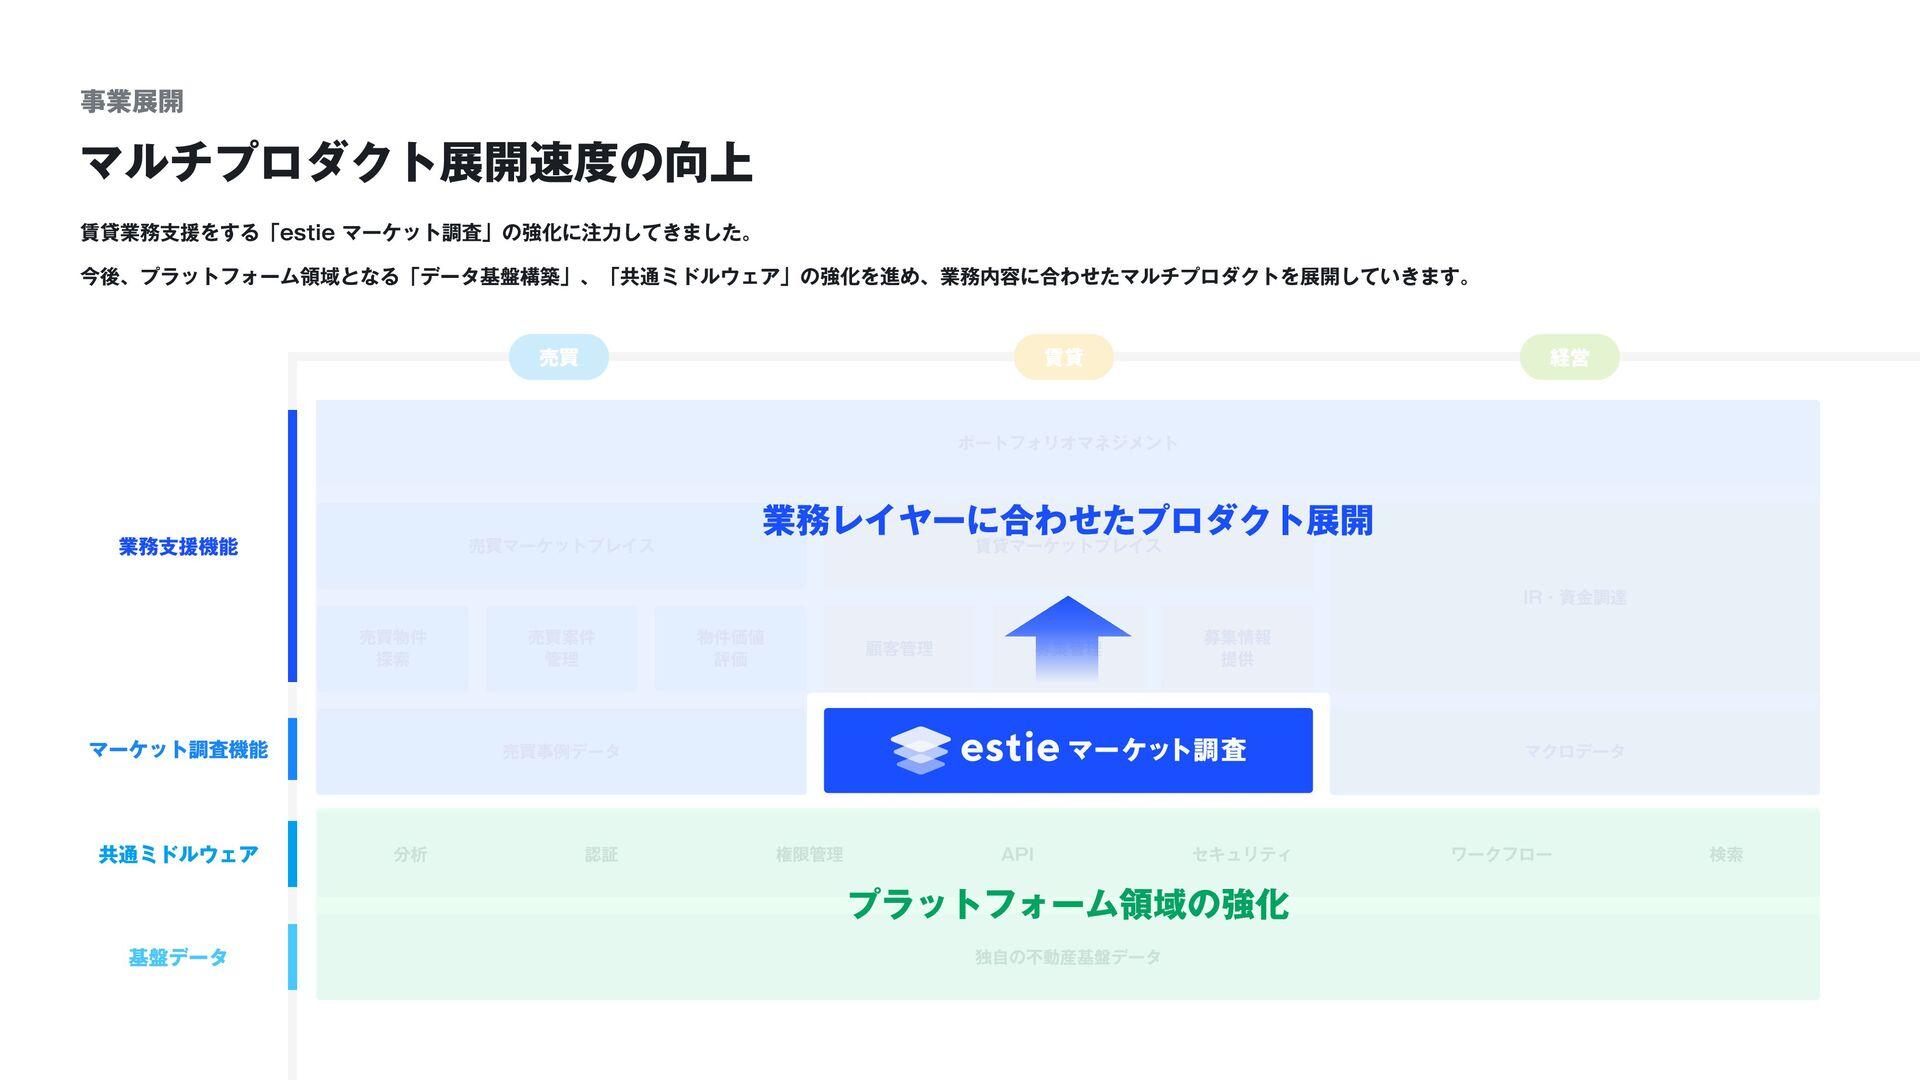 ©︎ 2020 estie, inc. 15 推定成約賃料 (e-賃料) の機械学習モデル ...